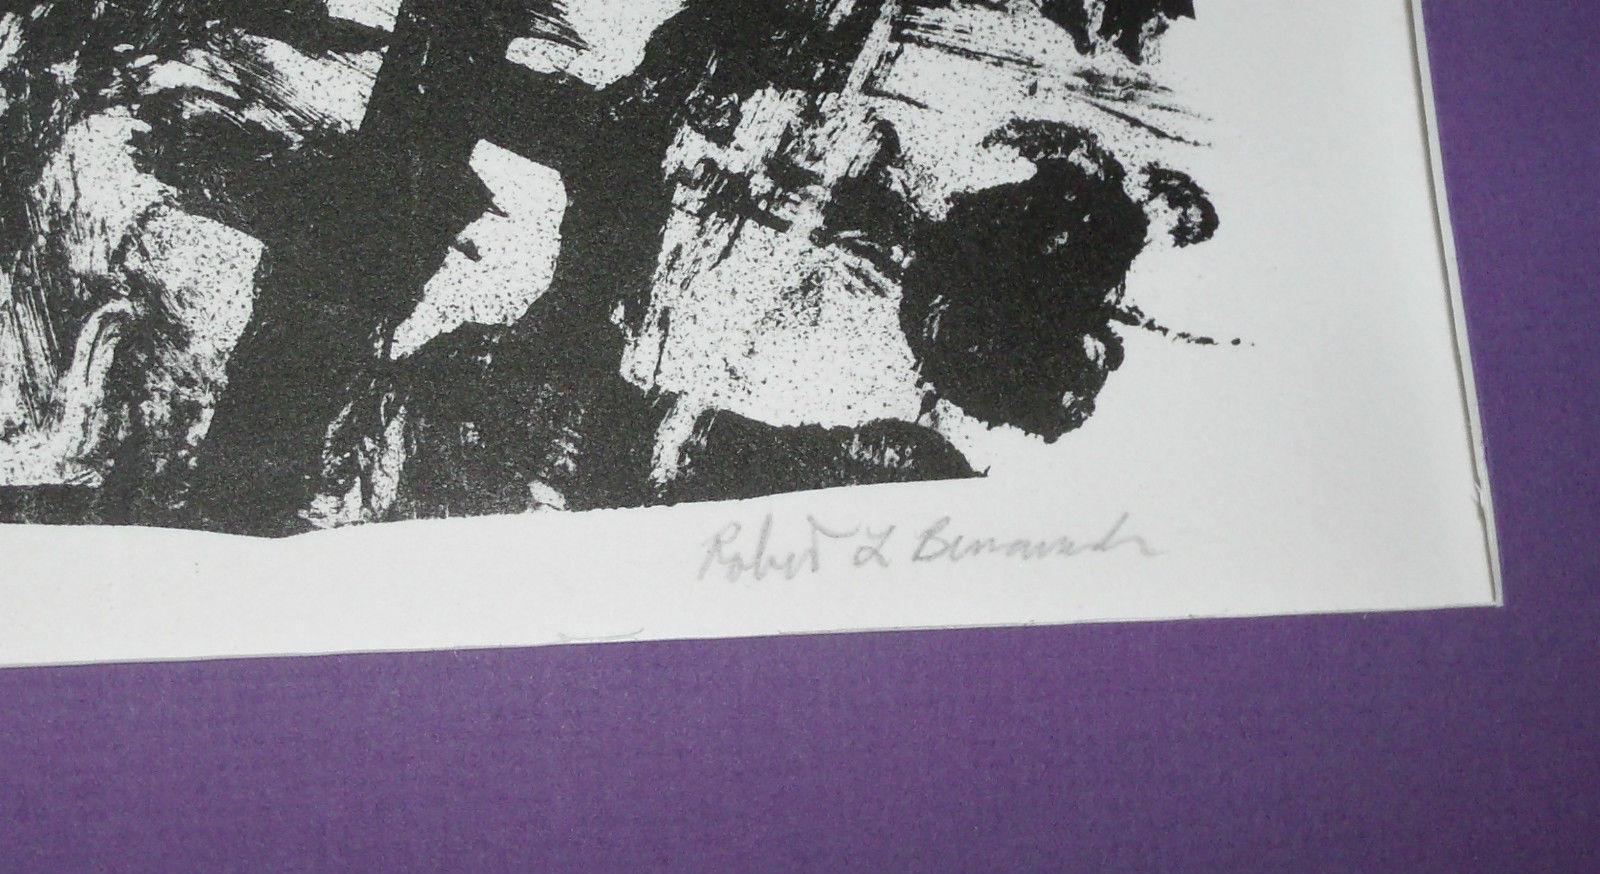 WOODBLOCK PRINT 15X22 LIMITED EDITION BY ROBERT L BENNARD